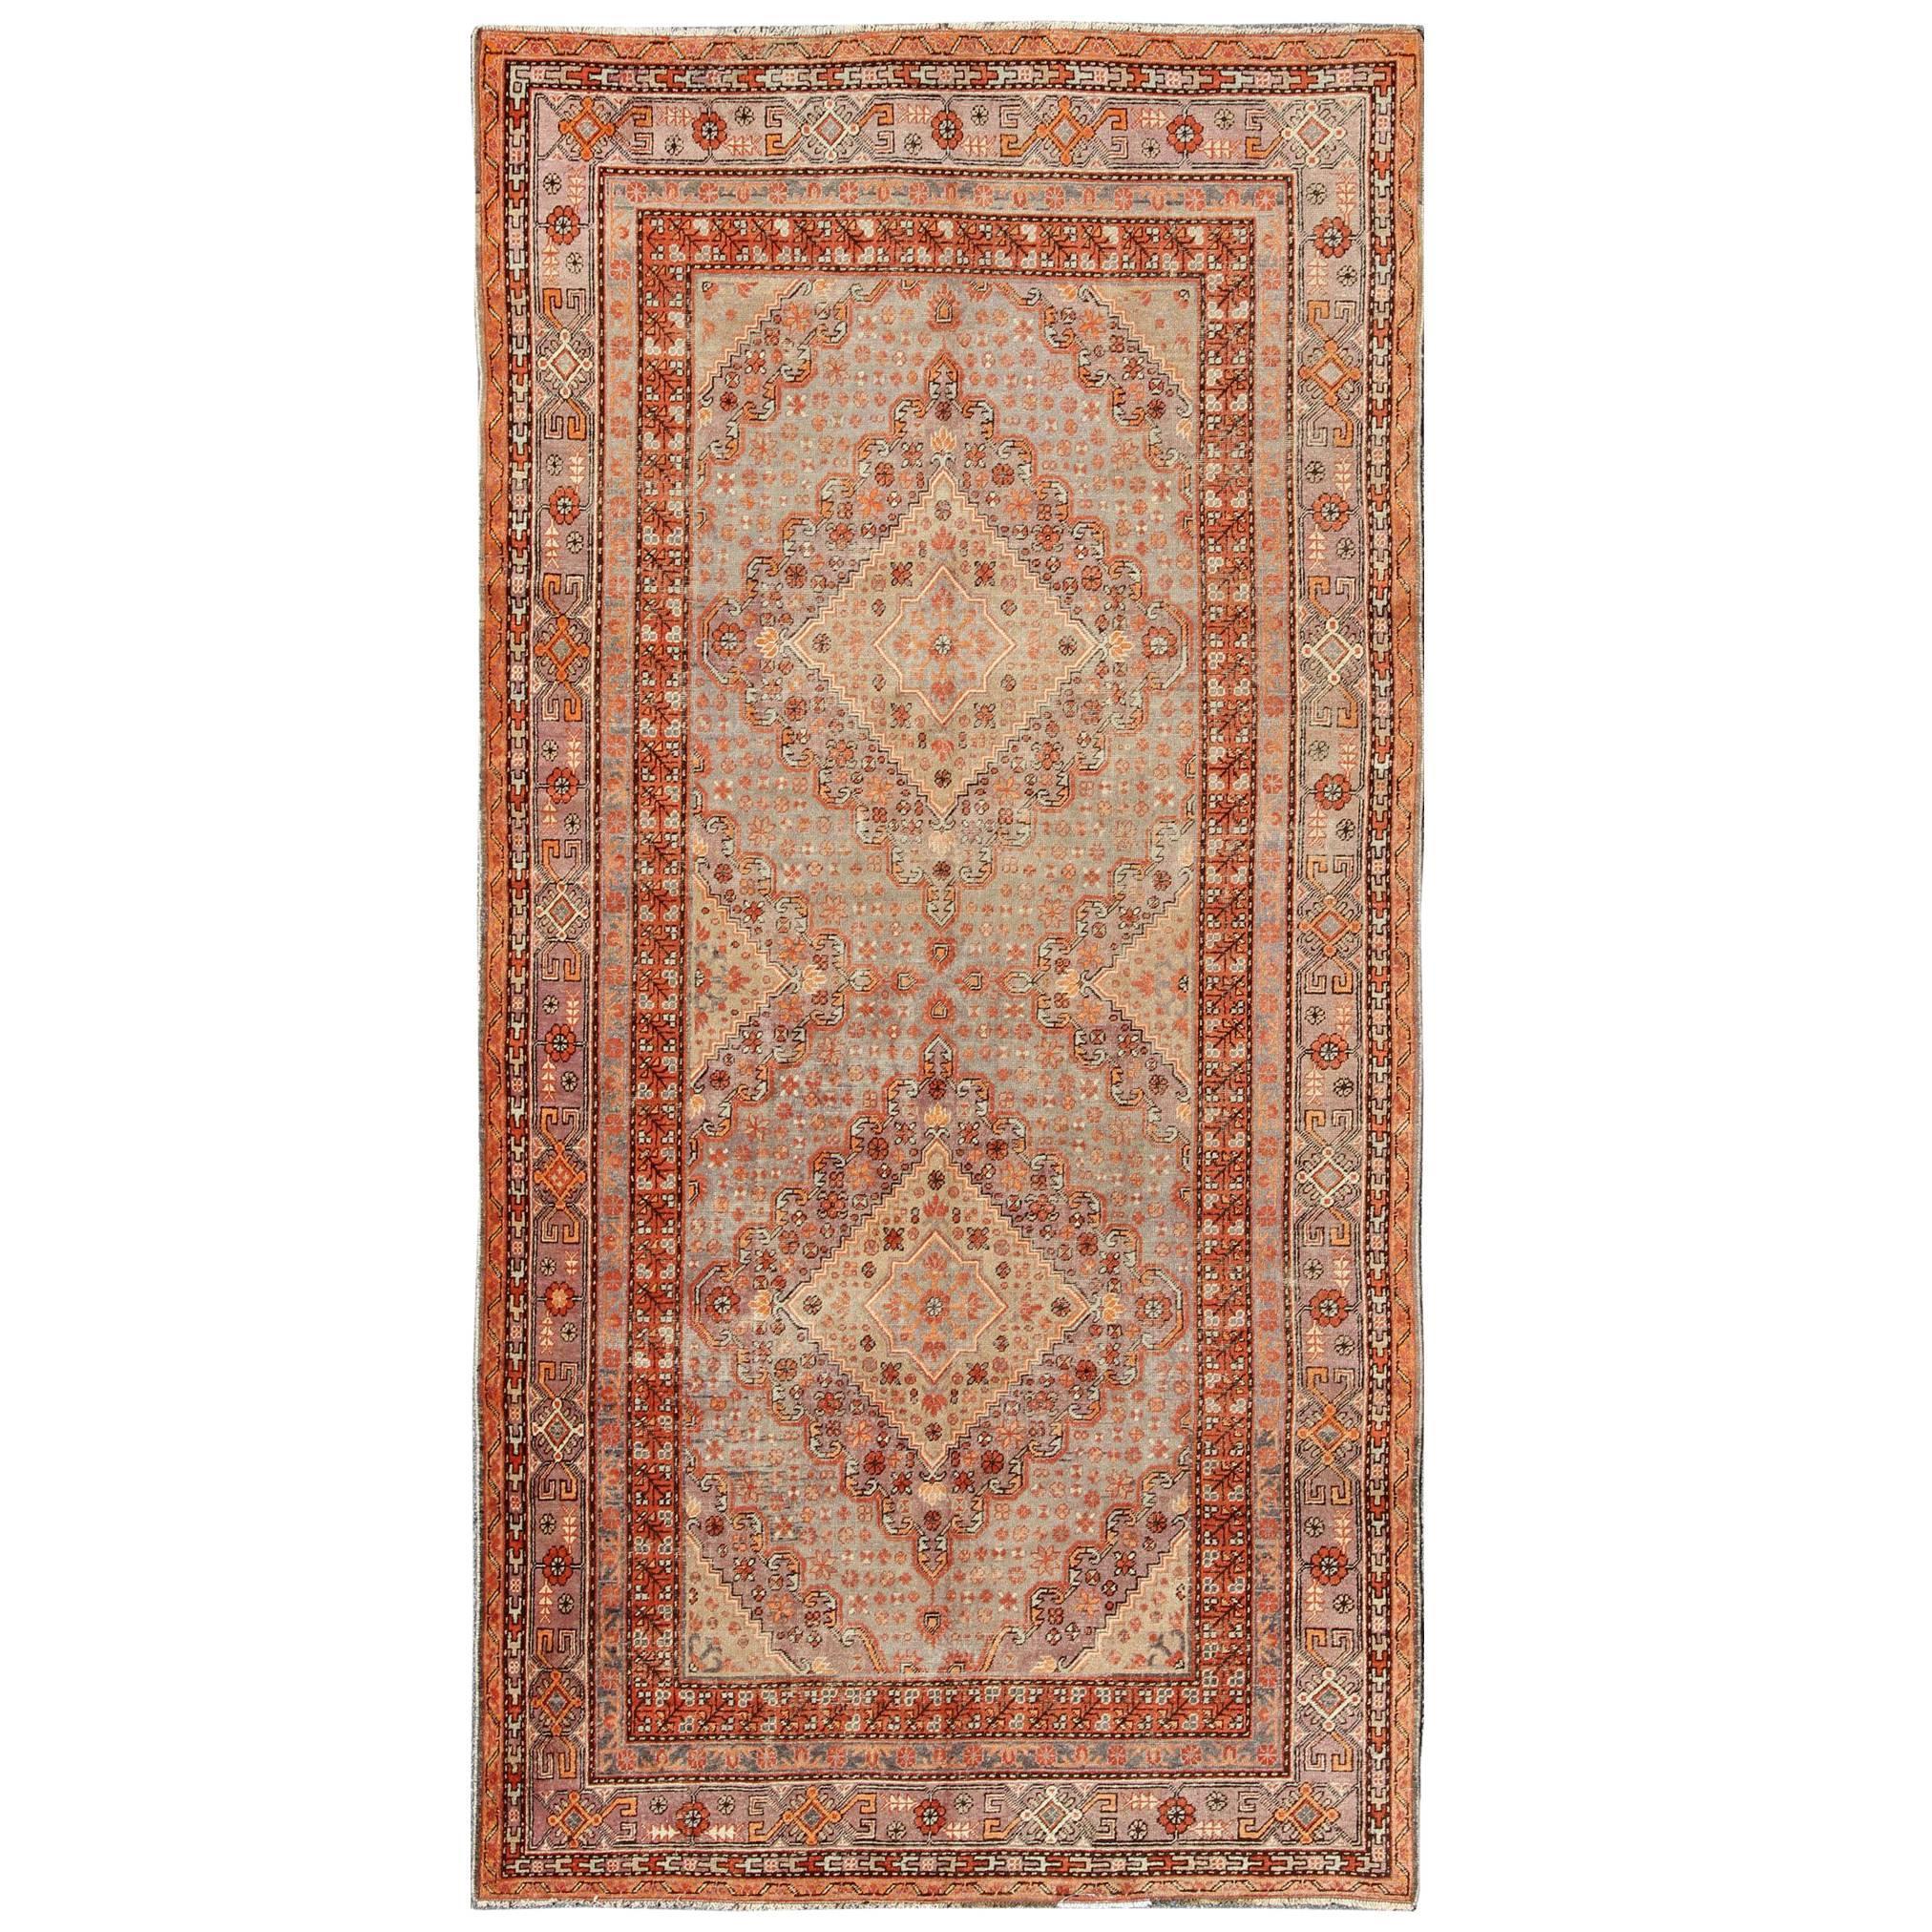 Antique Khotan/Samarkand Rug in Gray, Lavender, Rust  and Light Green